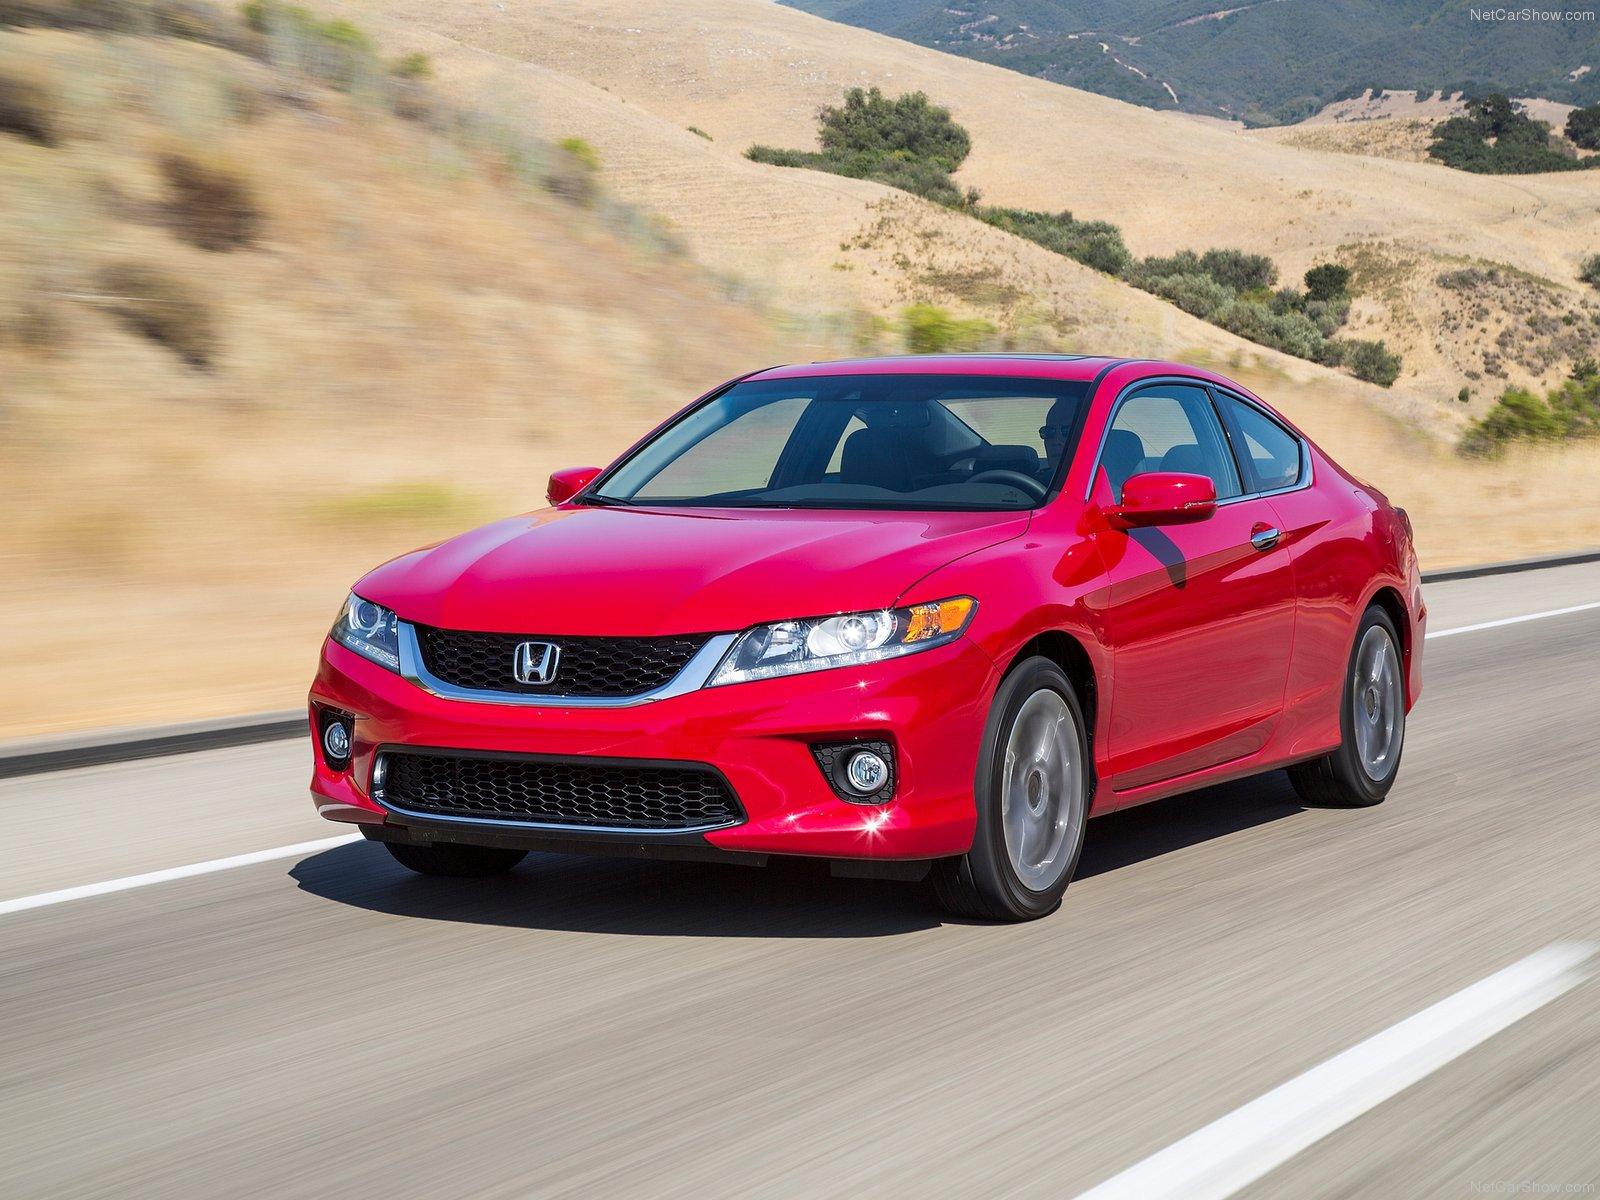 Honda accord coupe 2012 2013 2014 2015 autoevolution for Honda accord coupe 2012